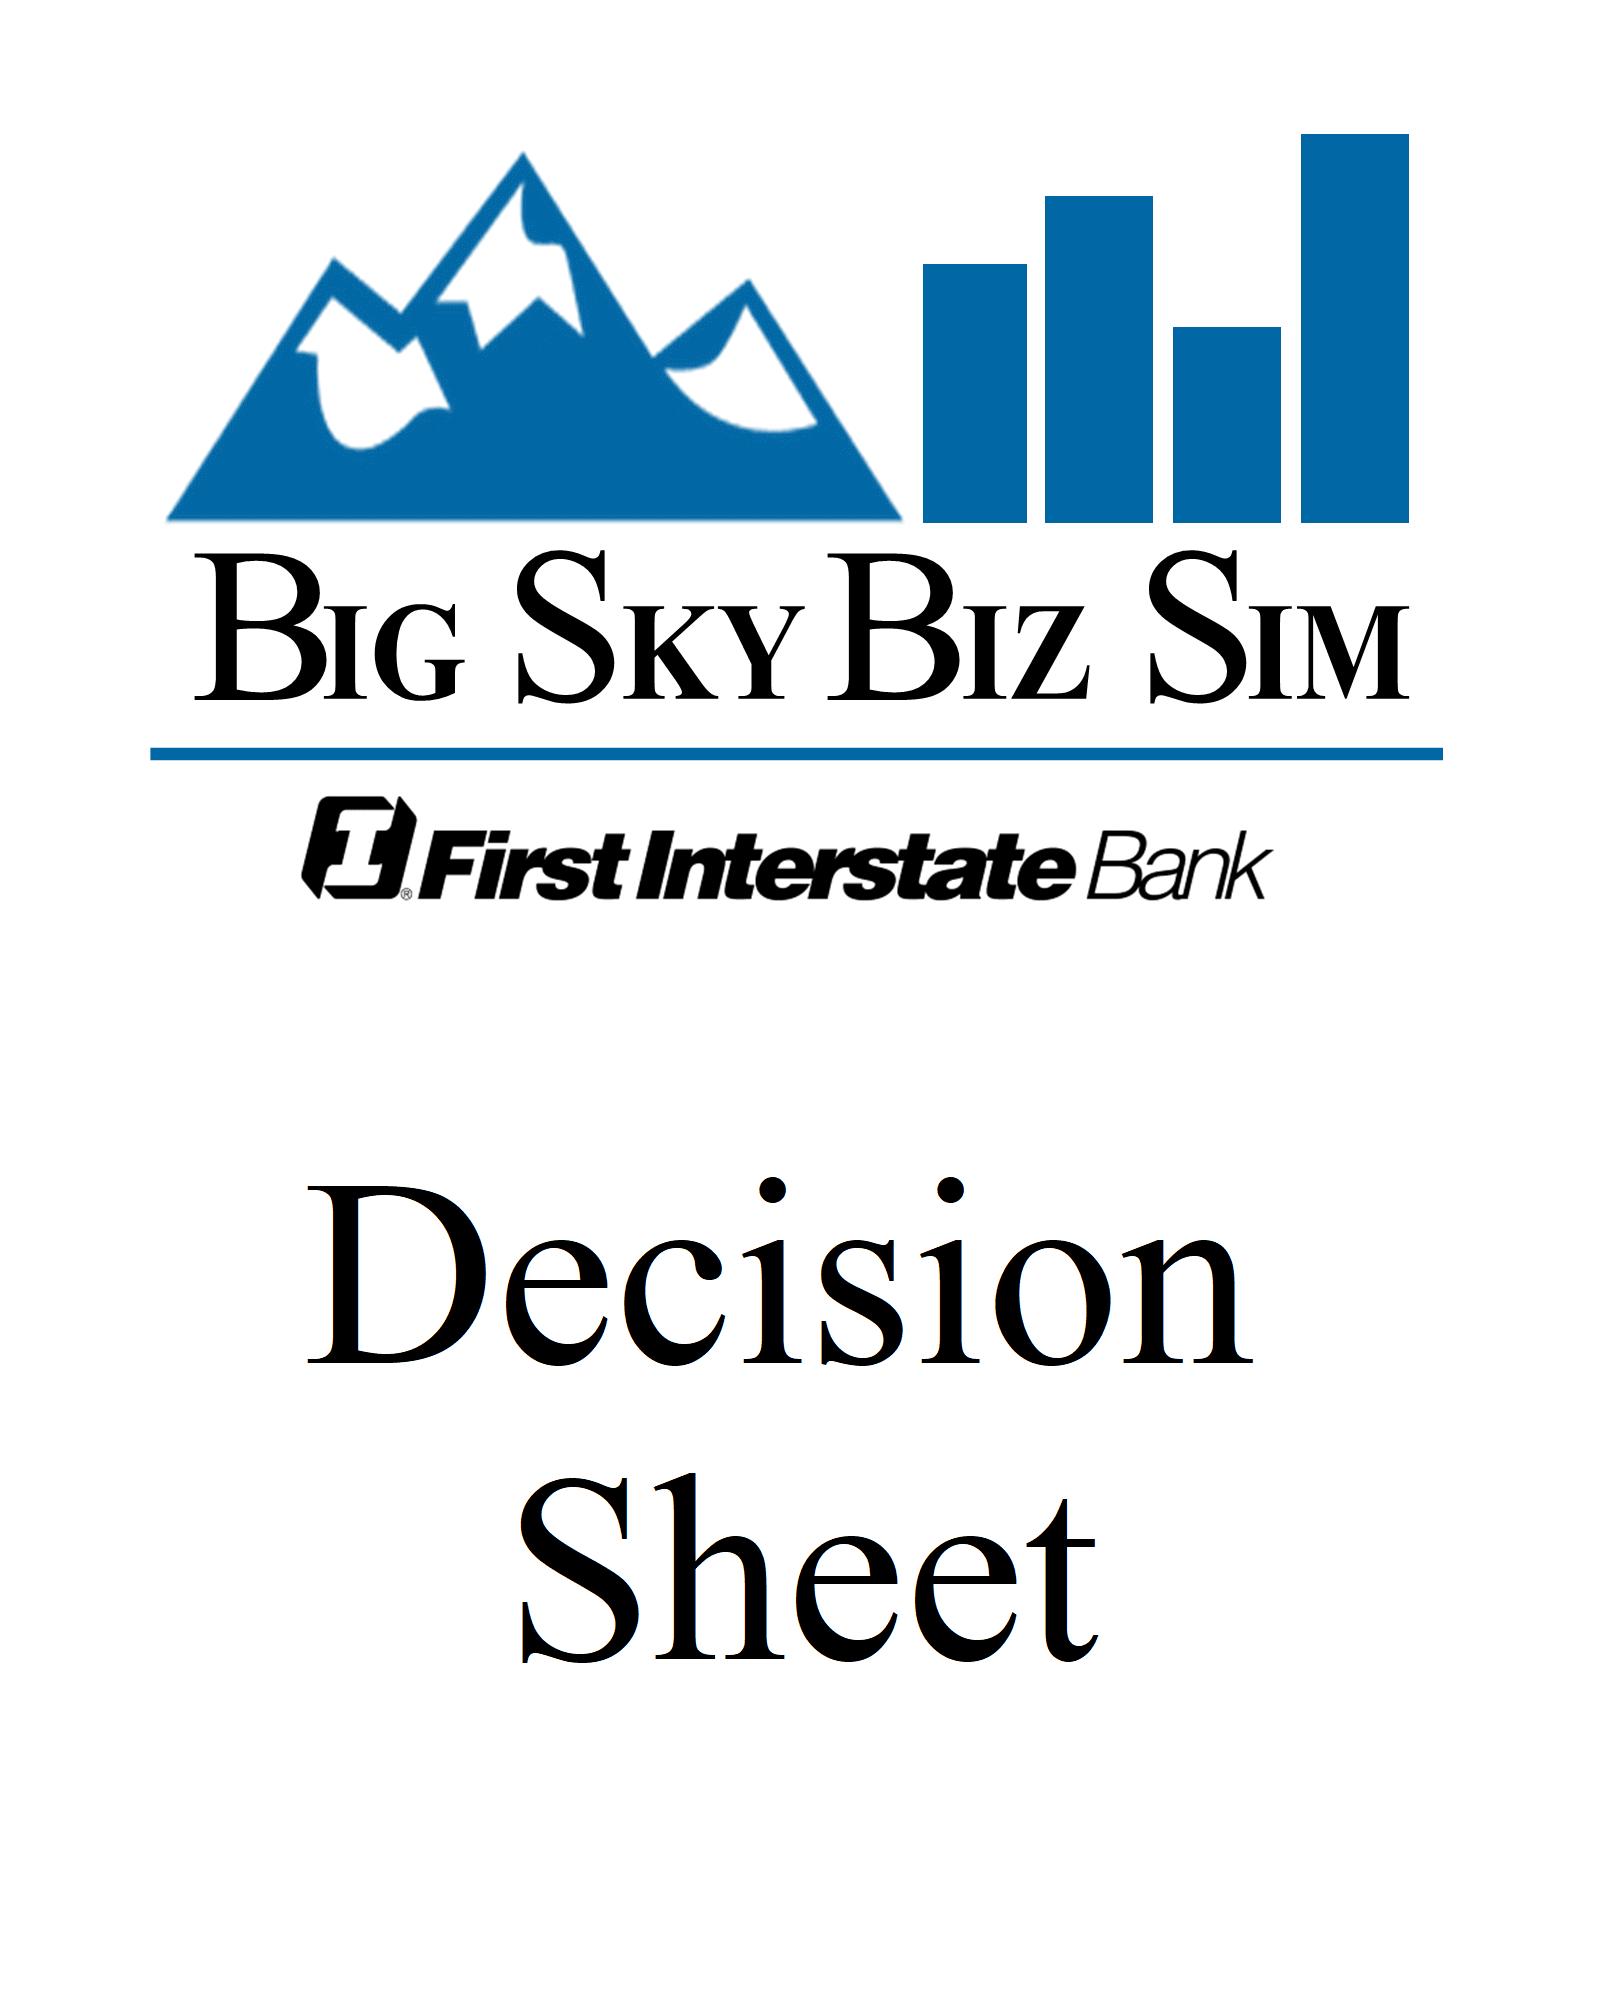 Decision Sheet